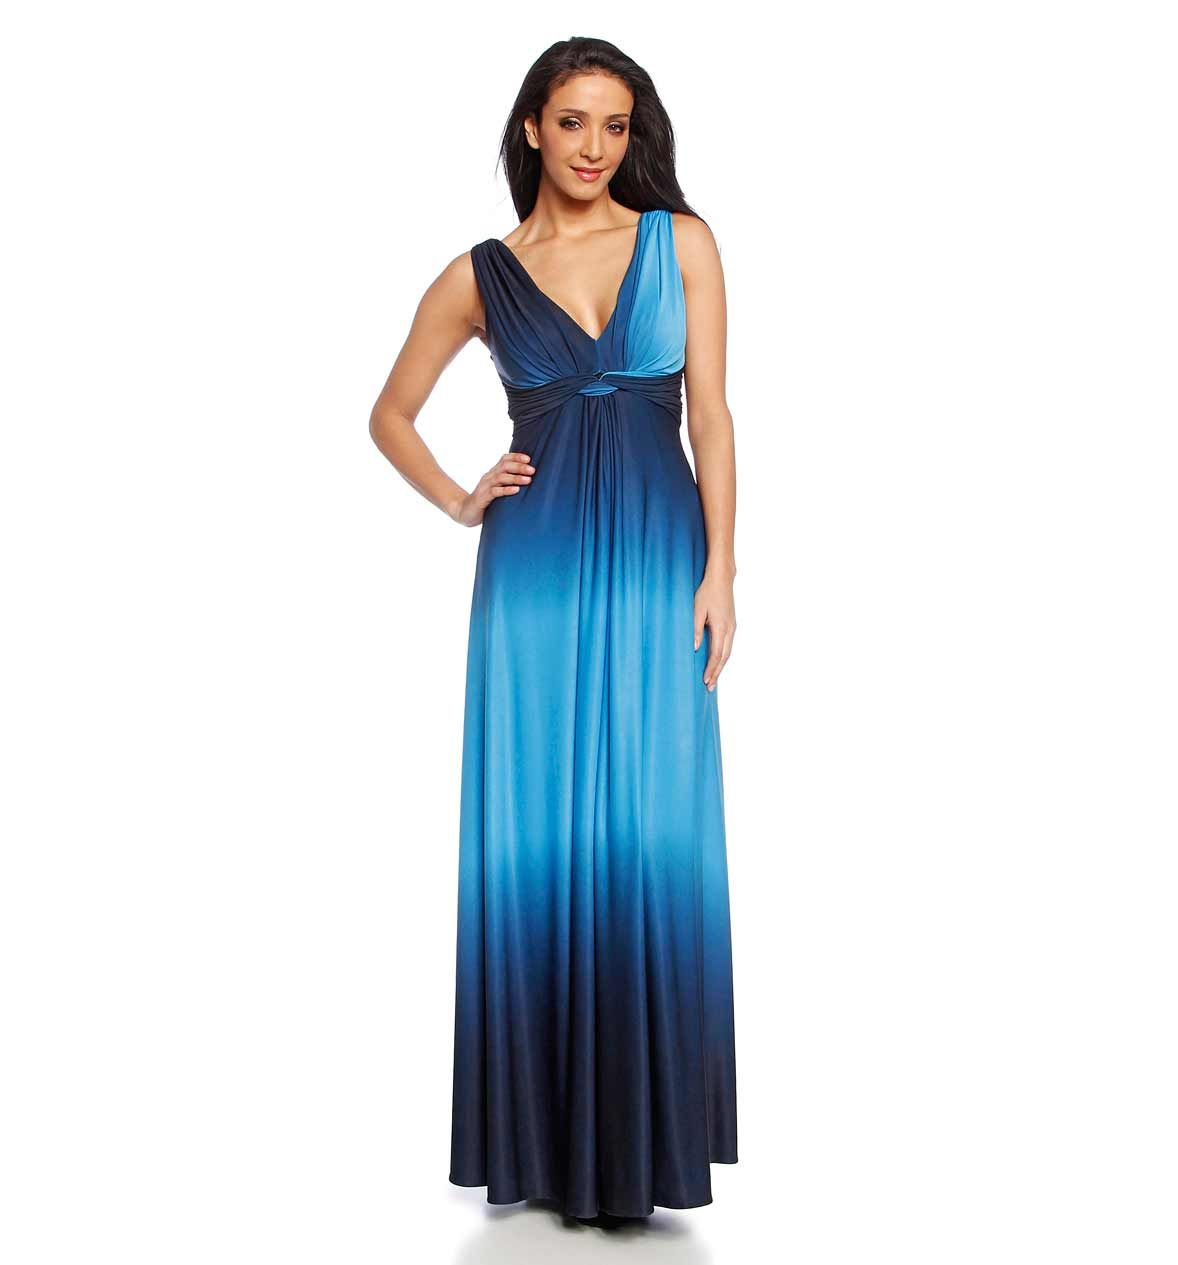 Vestido de fiesta azul/azul claro | My style | Pinterest | Vestidos ...